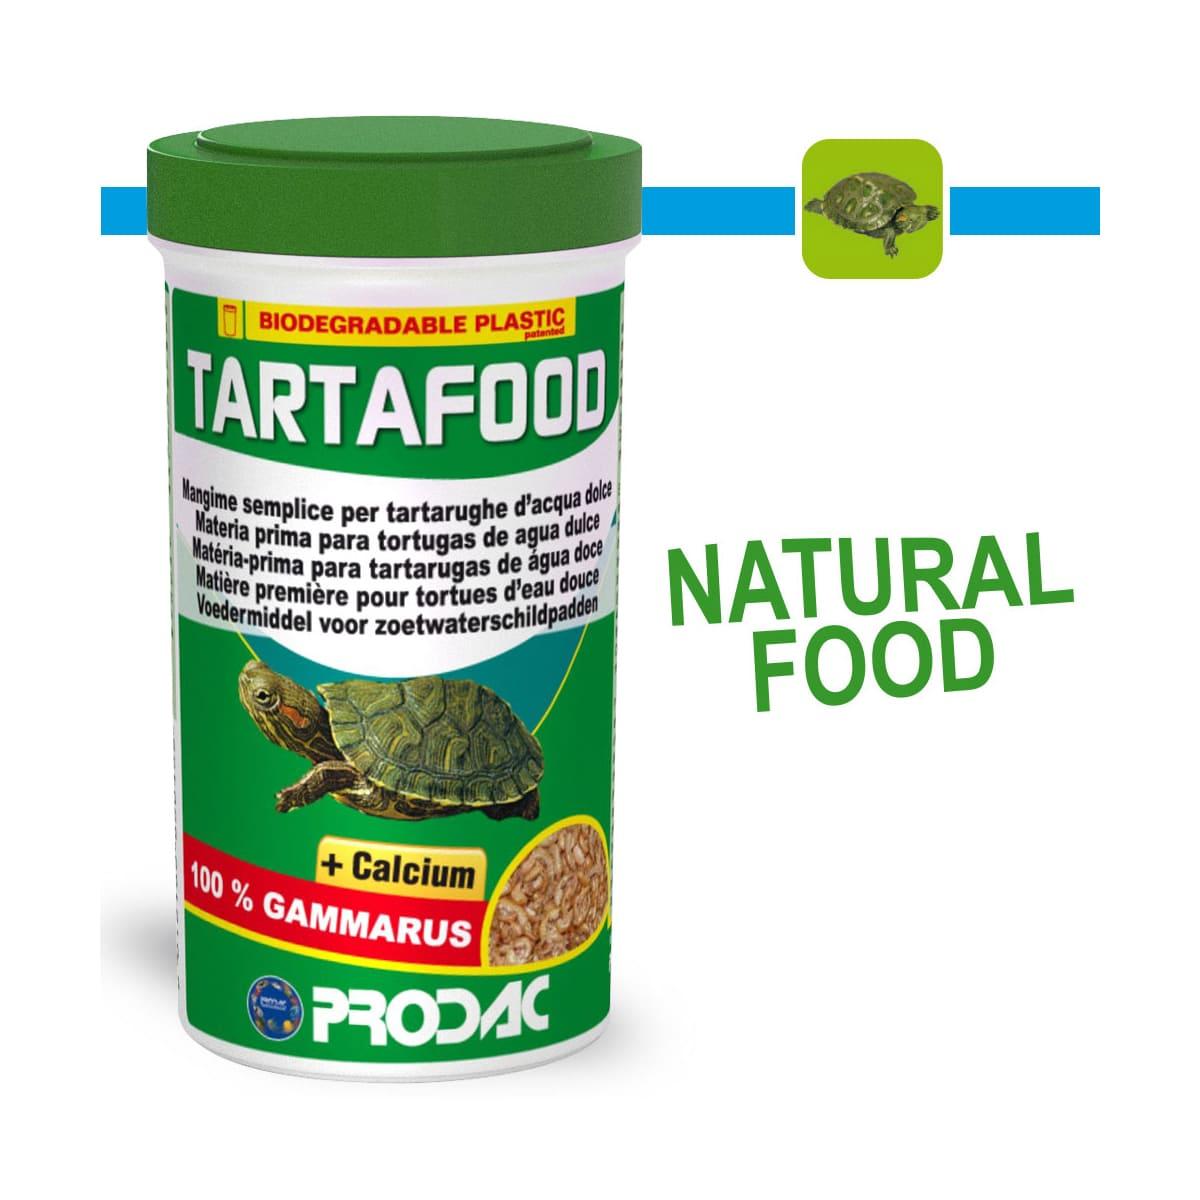 Ração Prodac Tartafood 10g - Tartarugas Aquáticas